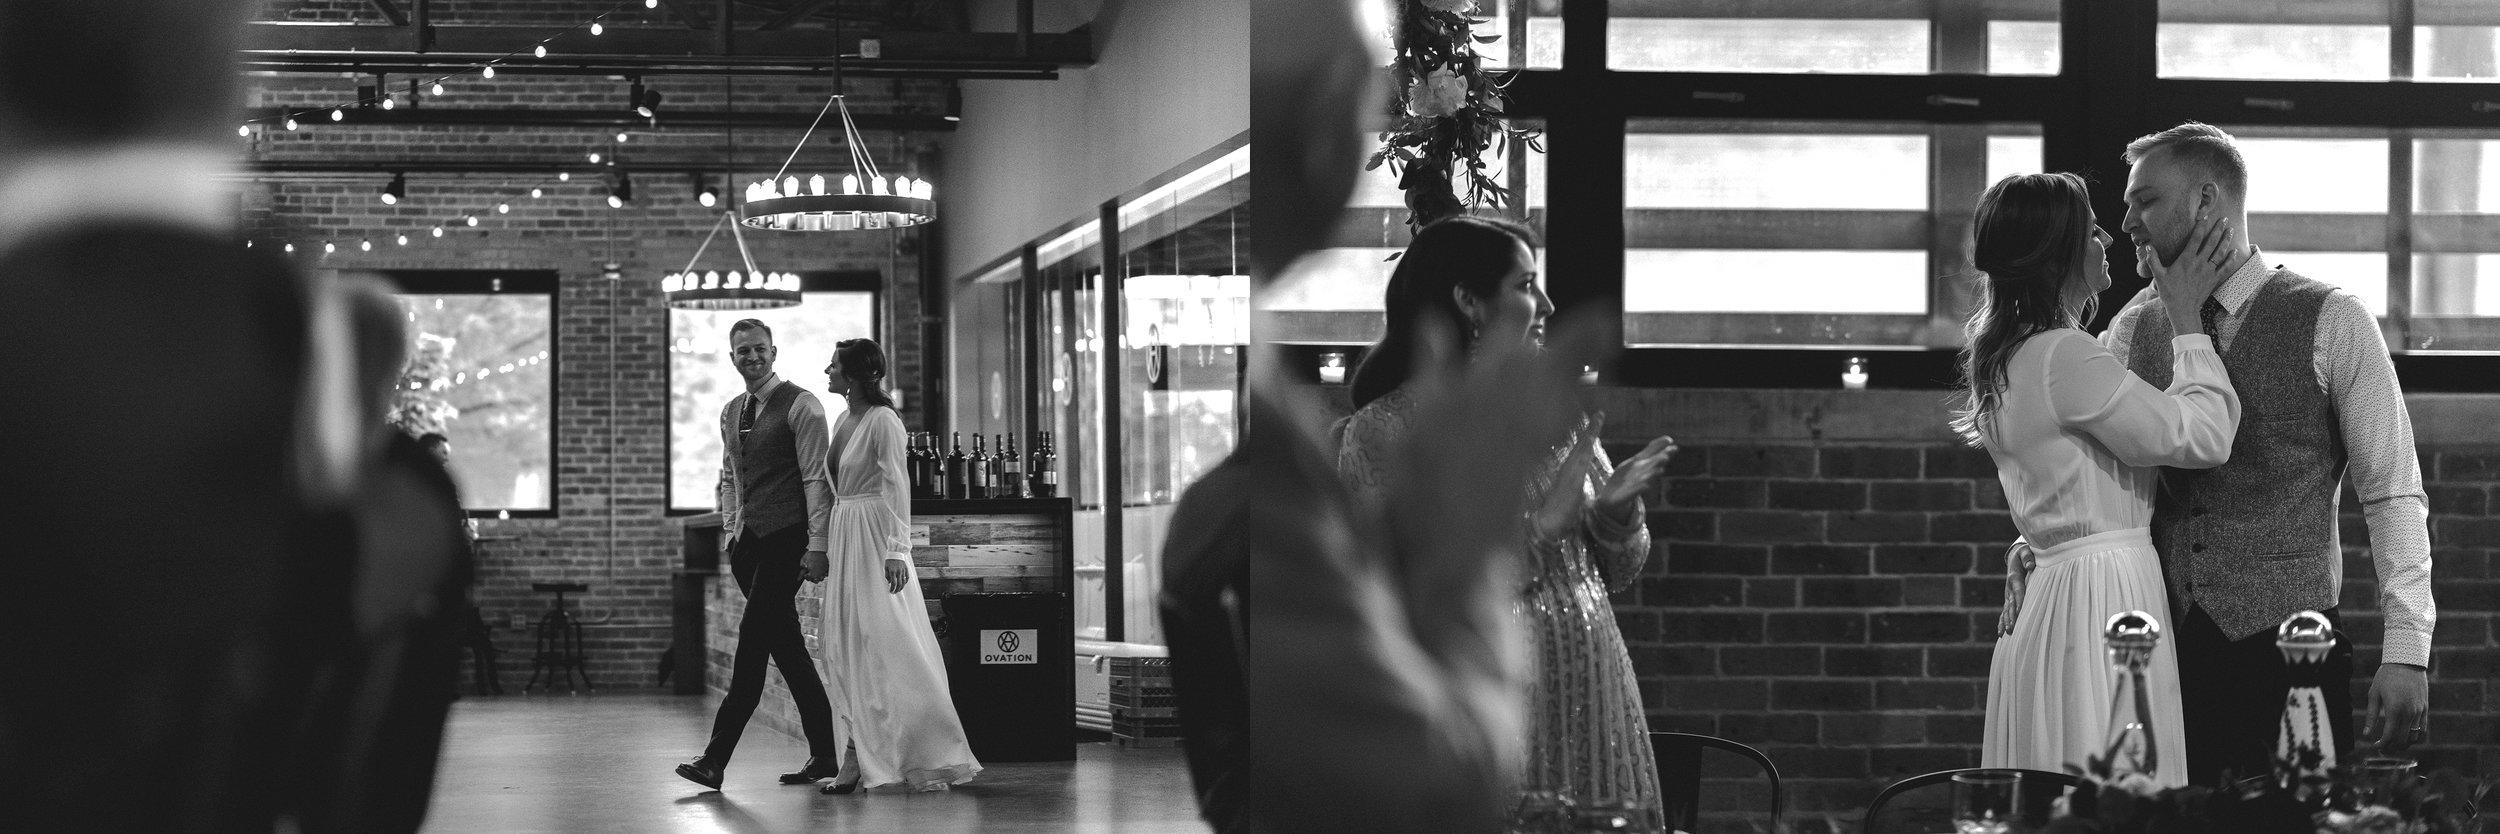 chicago_wedding_photography_zoe_rain_33.jpg